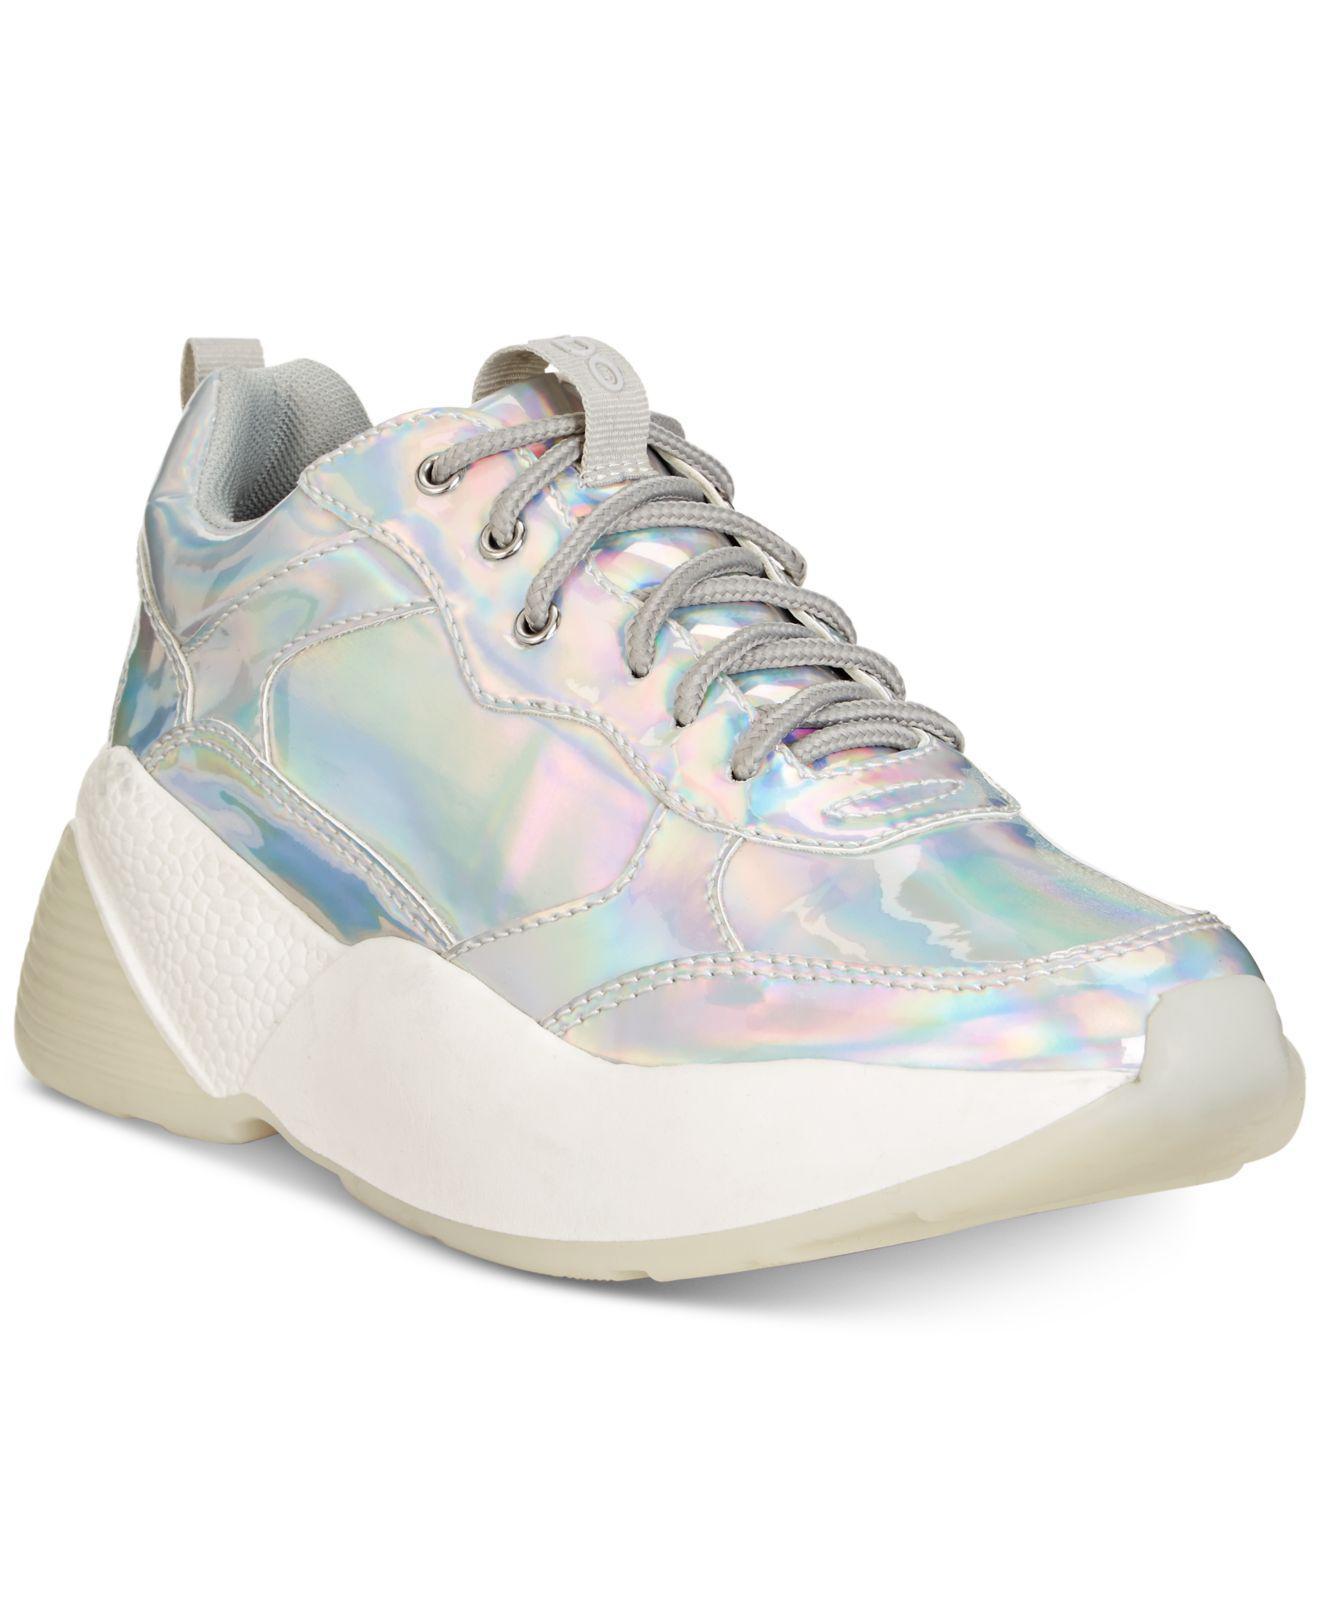 fea75dabf11 Lyst - ALDO Astaondra Chunky Sneakers in Metallic